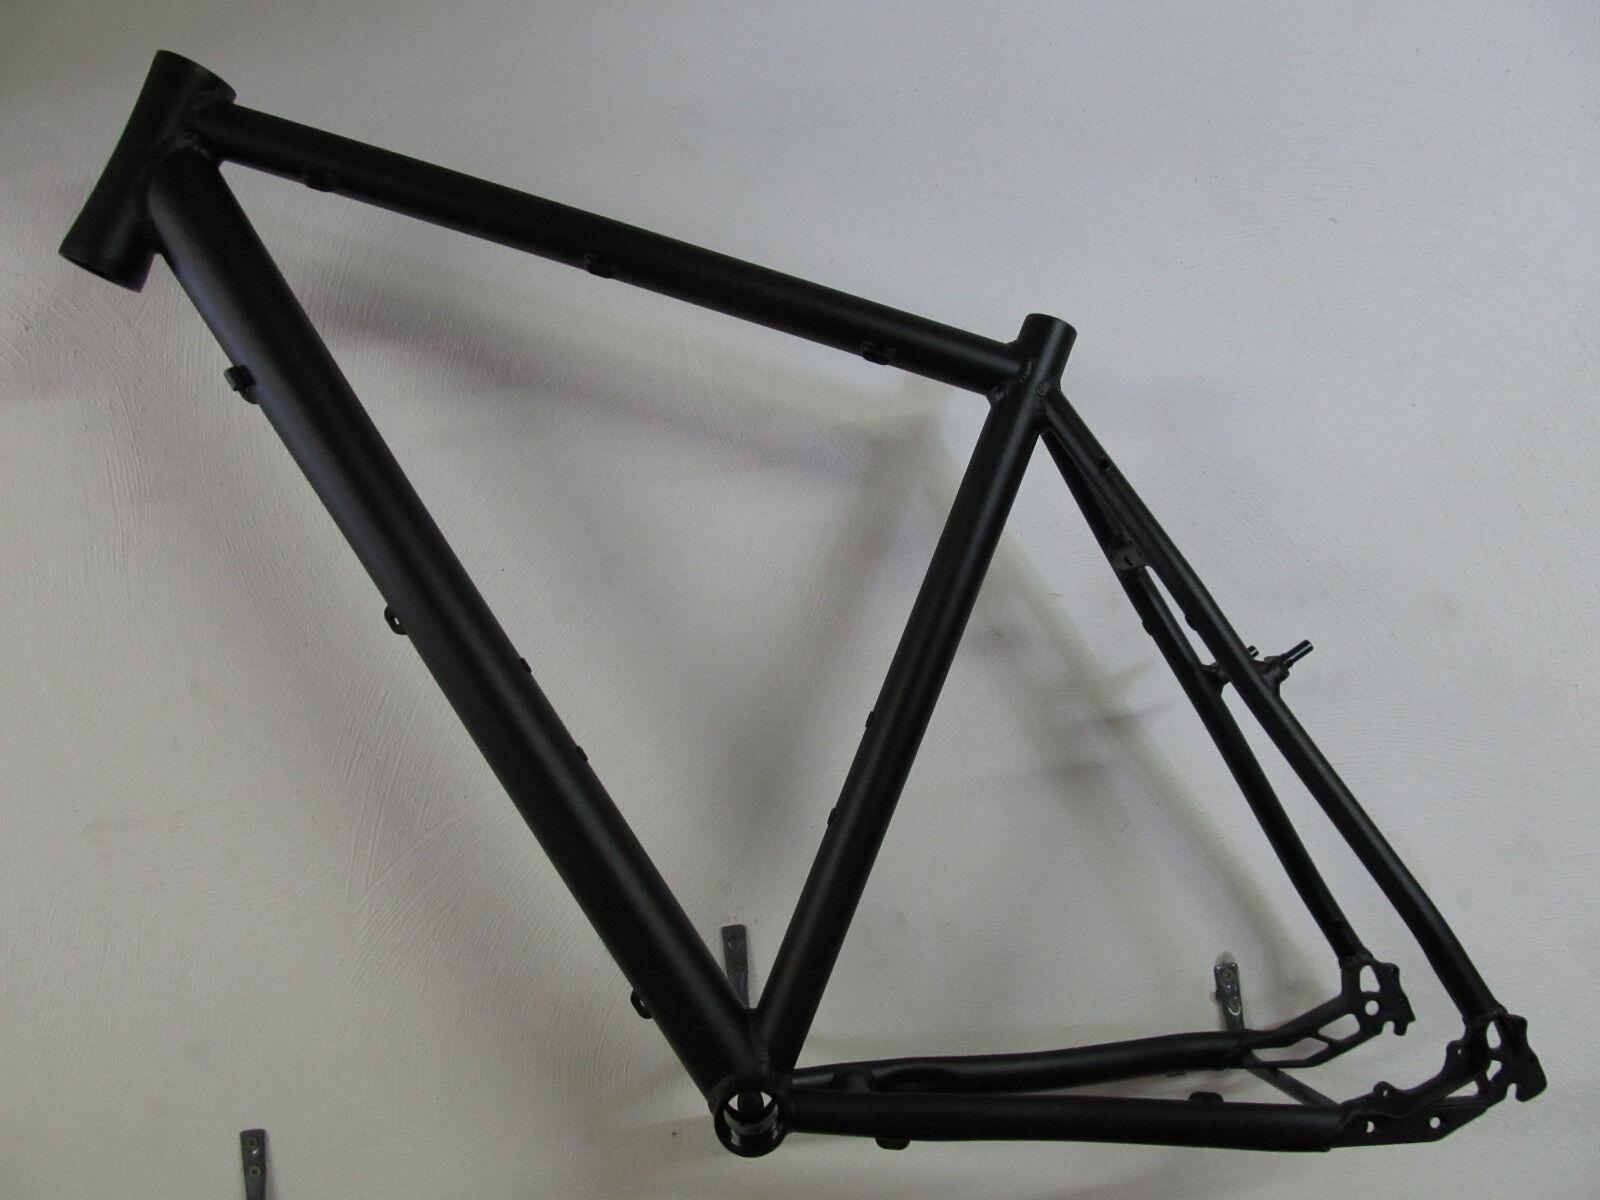 Heli-Bikes Ksl Cross Marco de Aluminio Trekking Hombre Nuevo 2018 52cm Negro